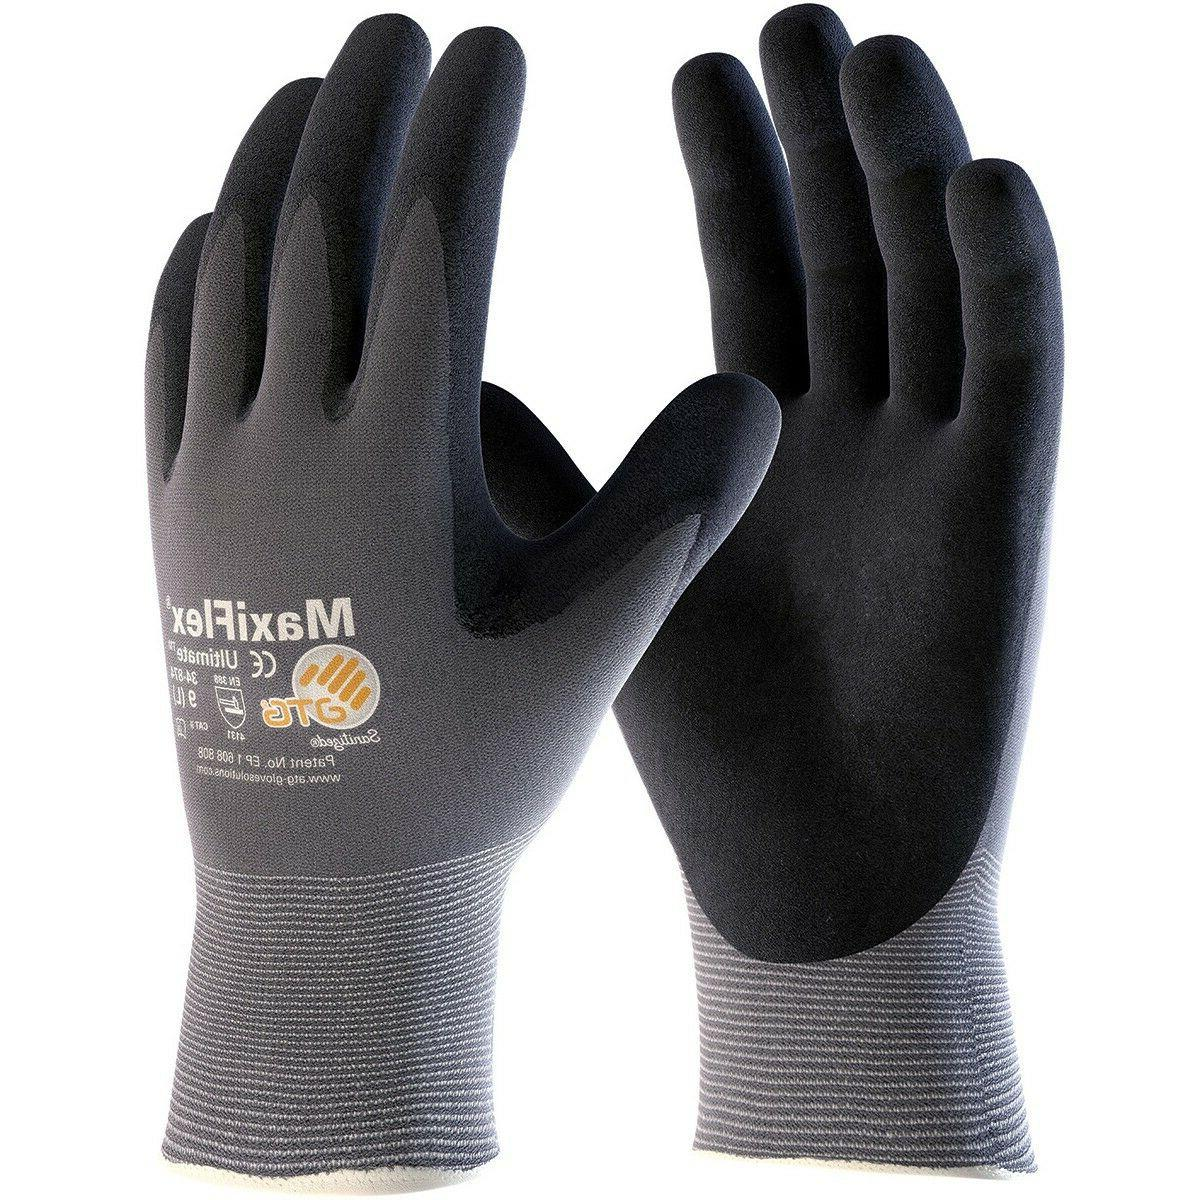 maxiflex ultimate nitrile foam coated knit nylon